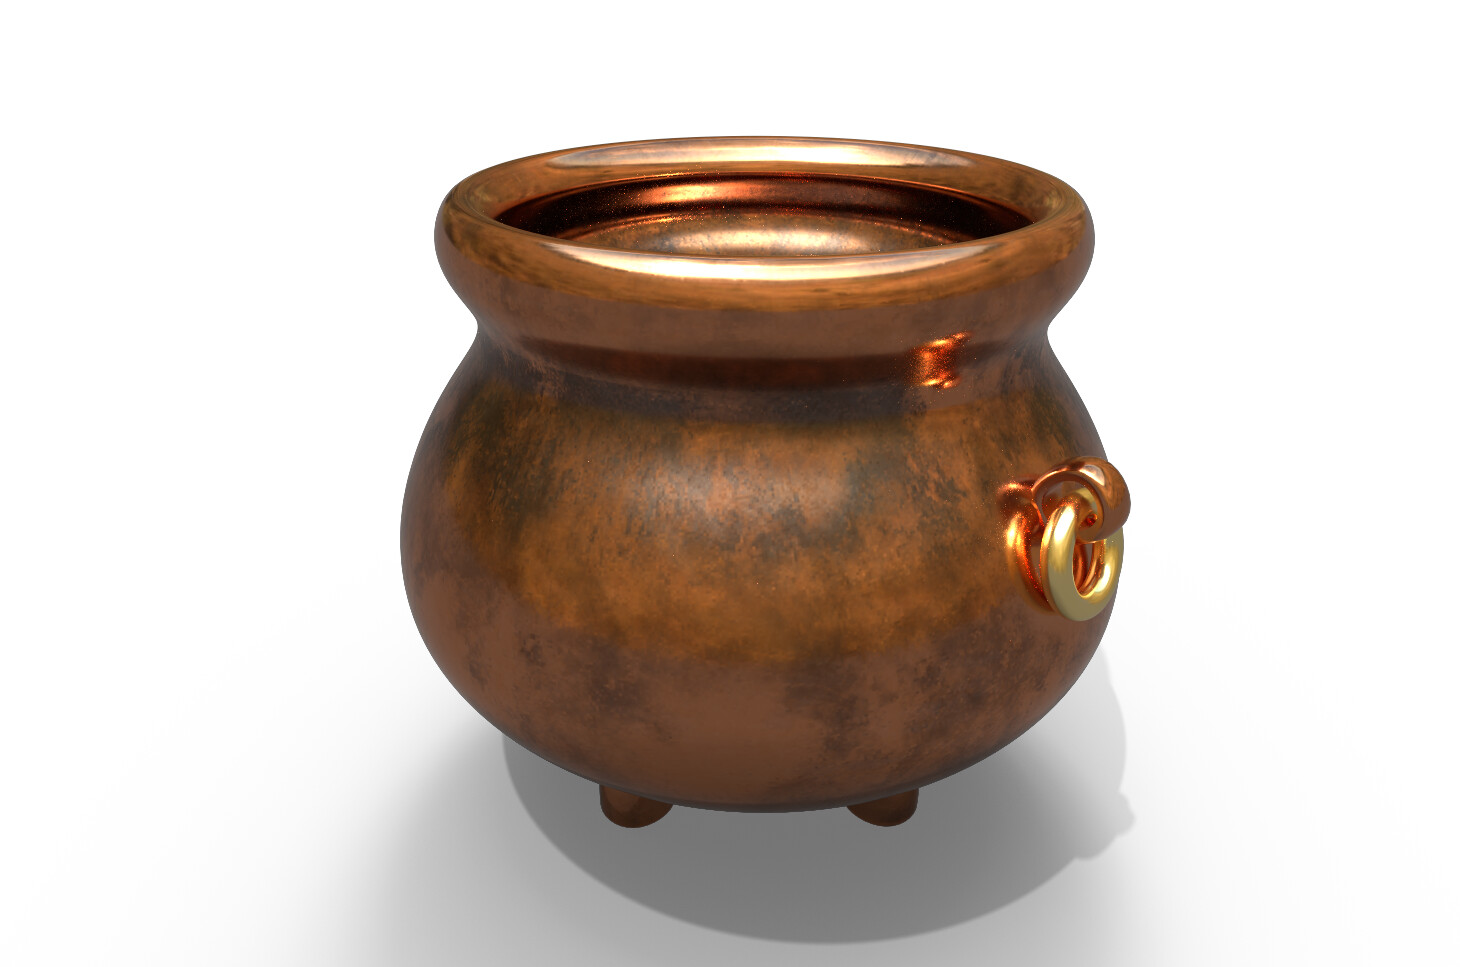 Joseph moniz cauldron001i